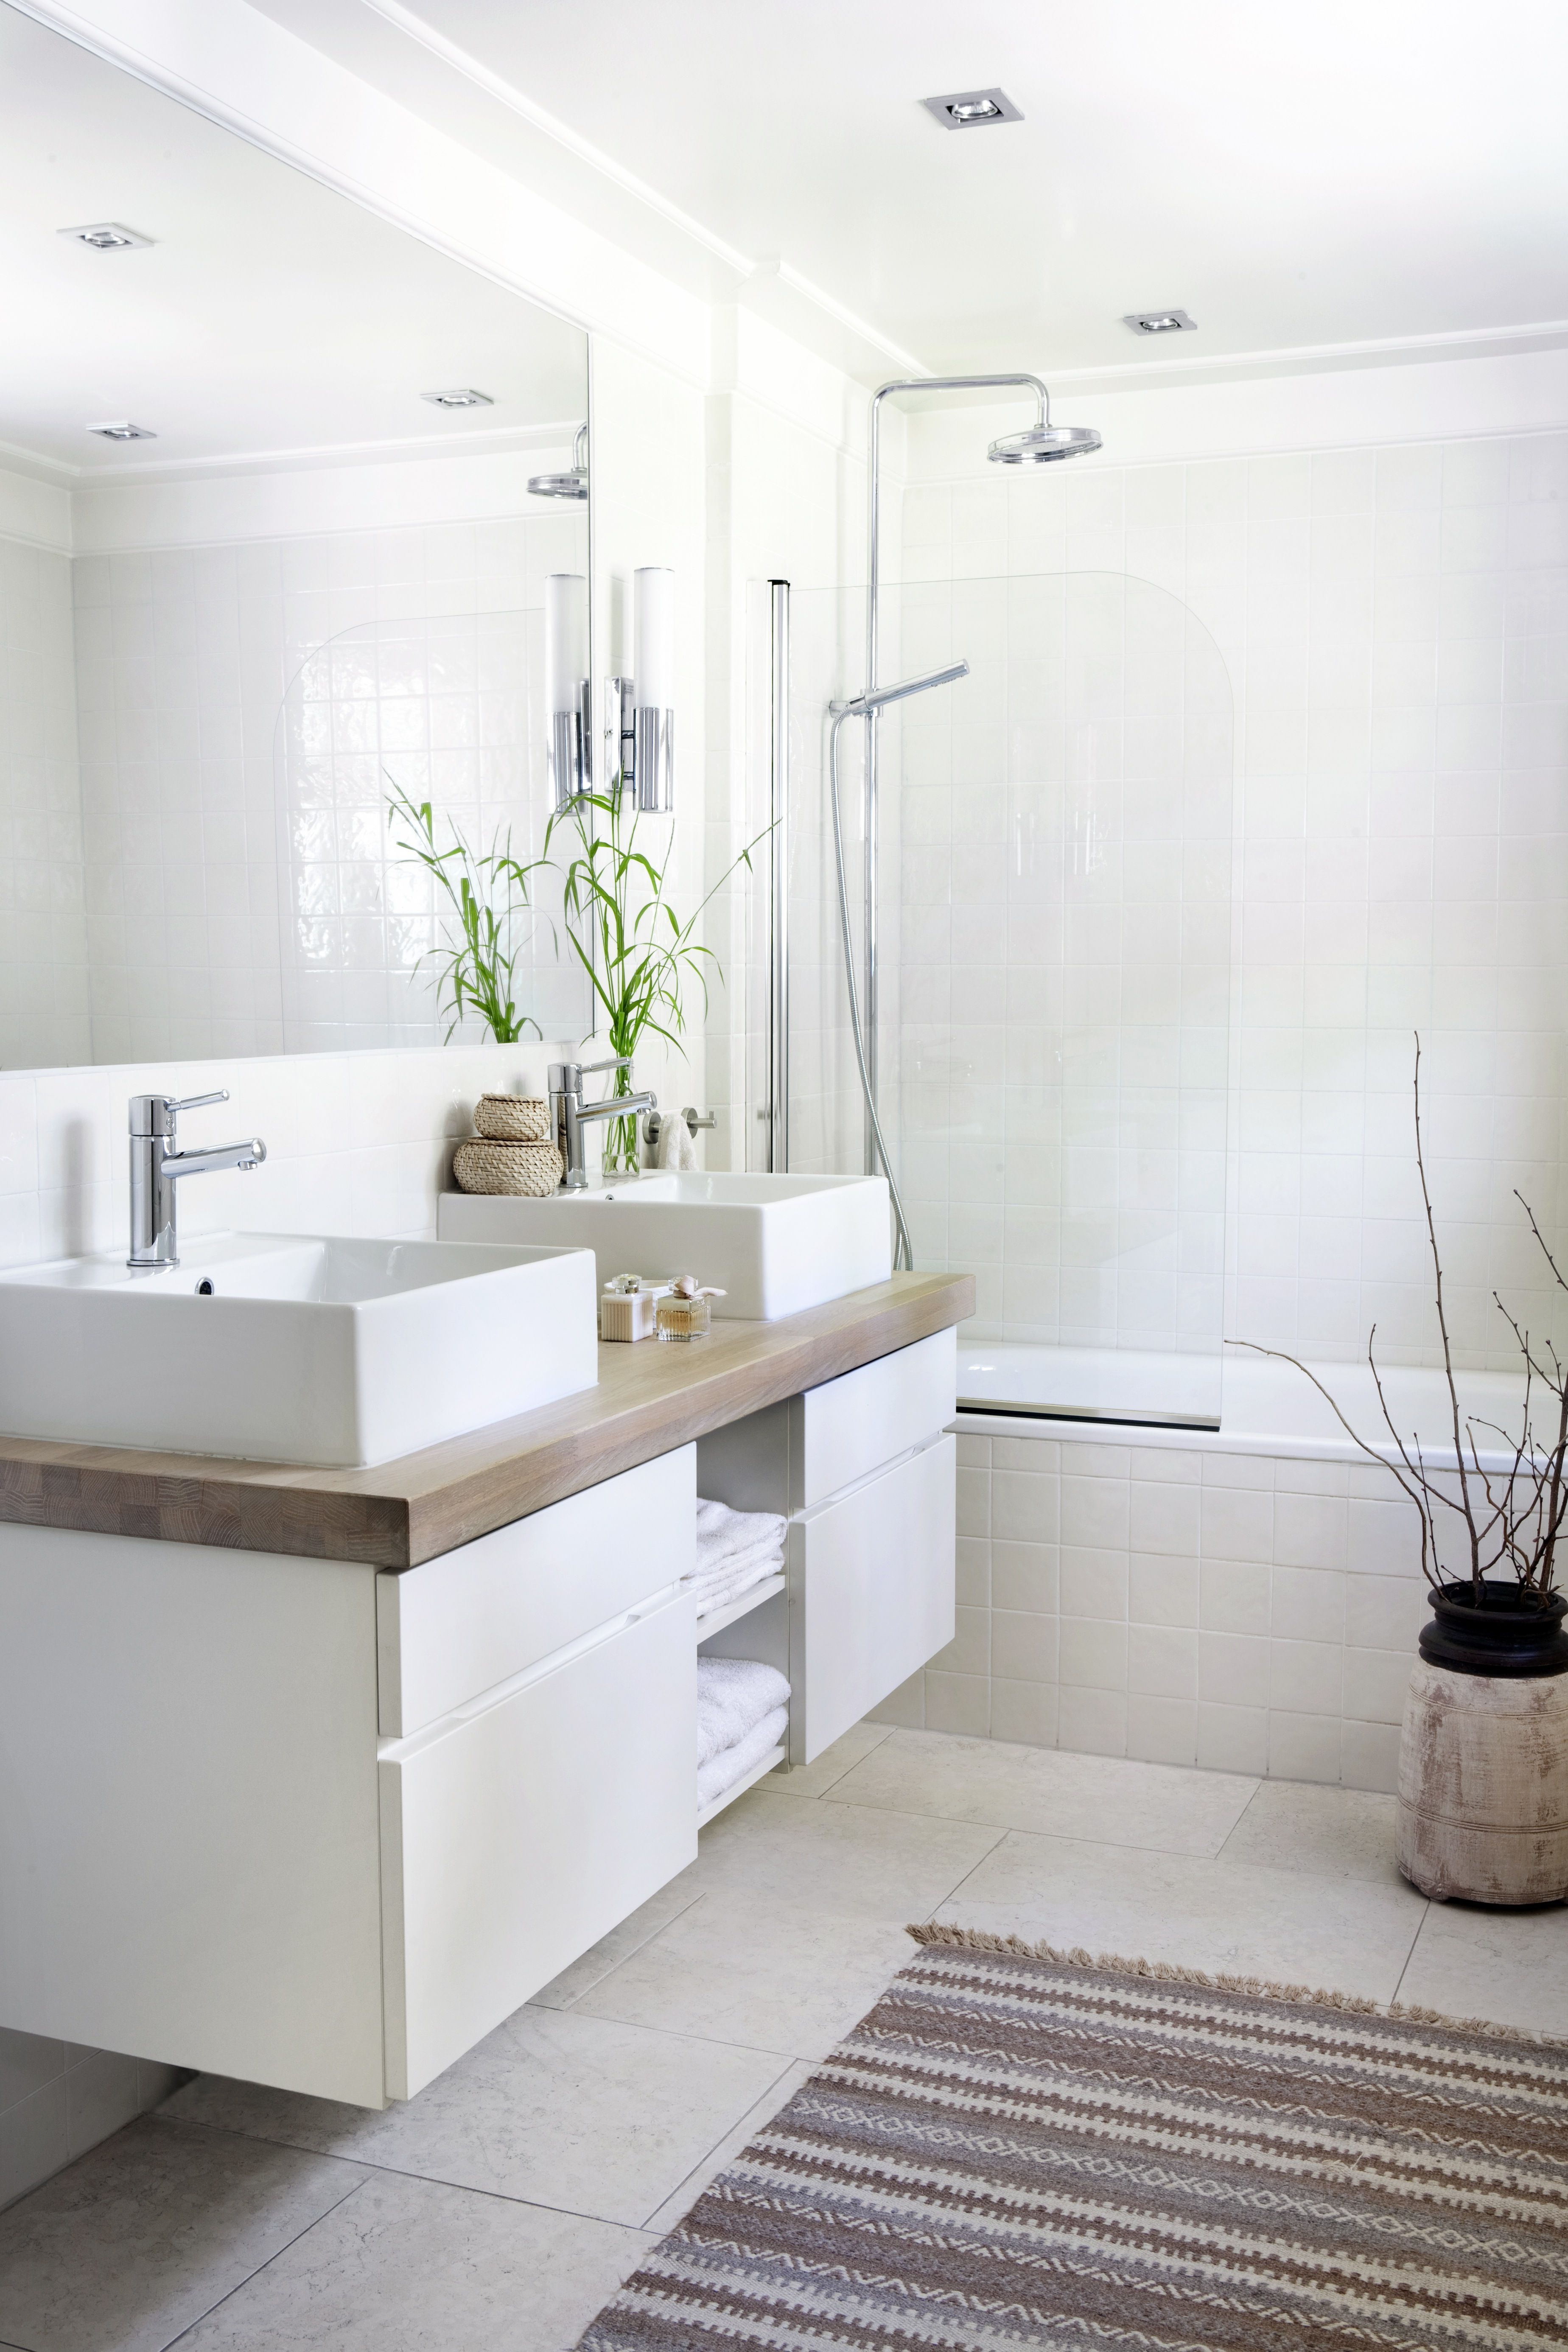 22 Best Scandinavian Bathroom Ideas You Should Know Small Bathroom Bathroom Remodel Master Bathroom Design